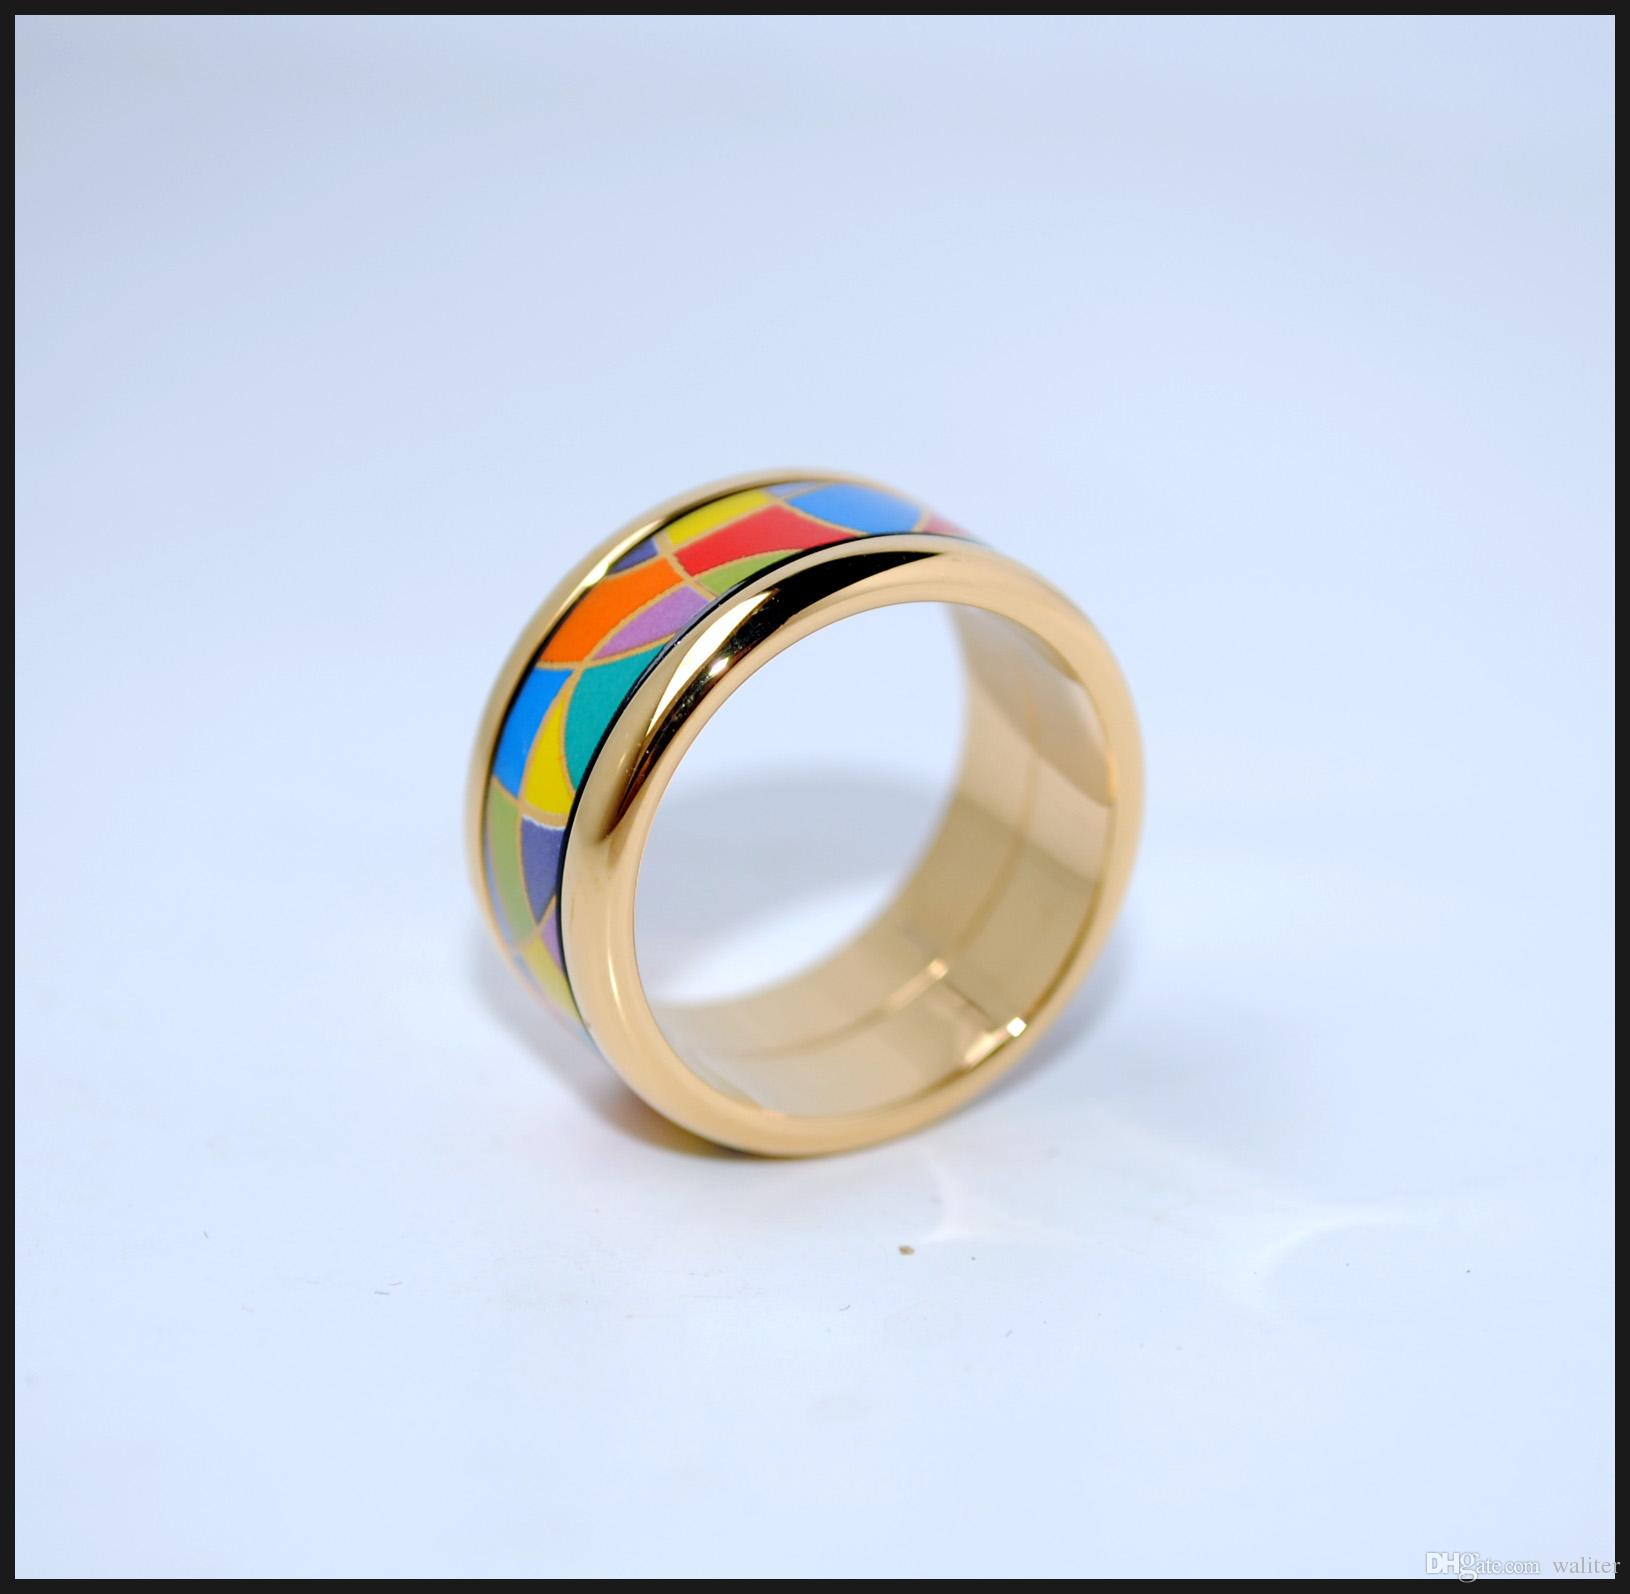 Enjoy Life Series 18K anillos de esmalte dorado Anillo de calidad superior para mujeres anillos de banda para regalo